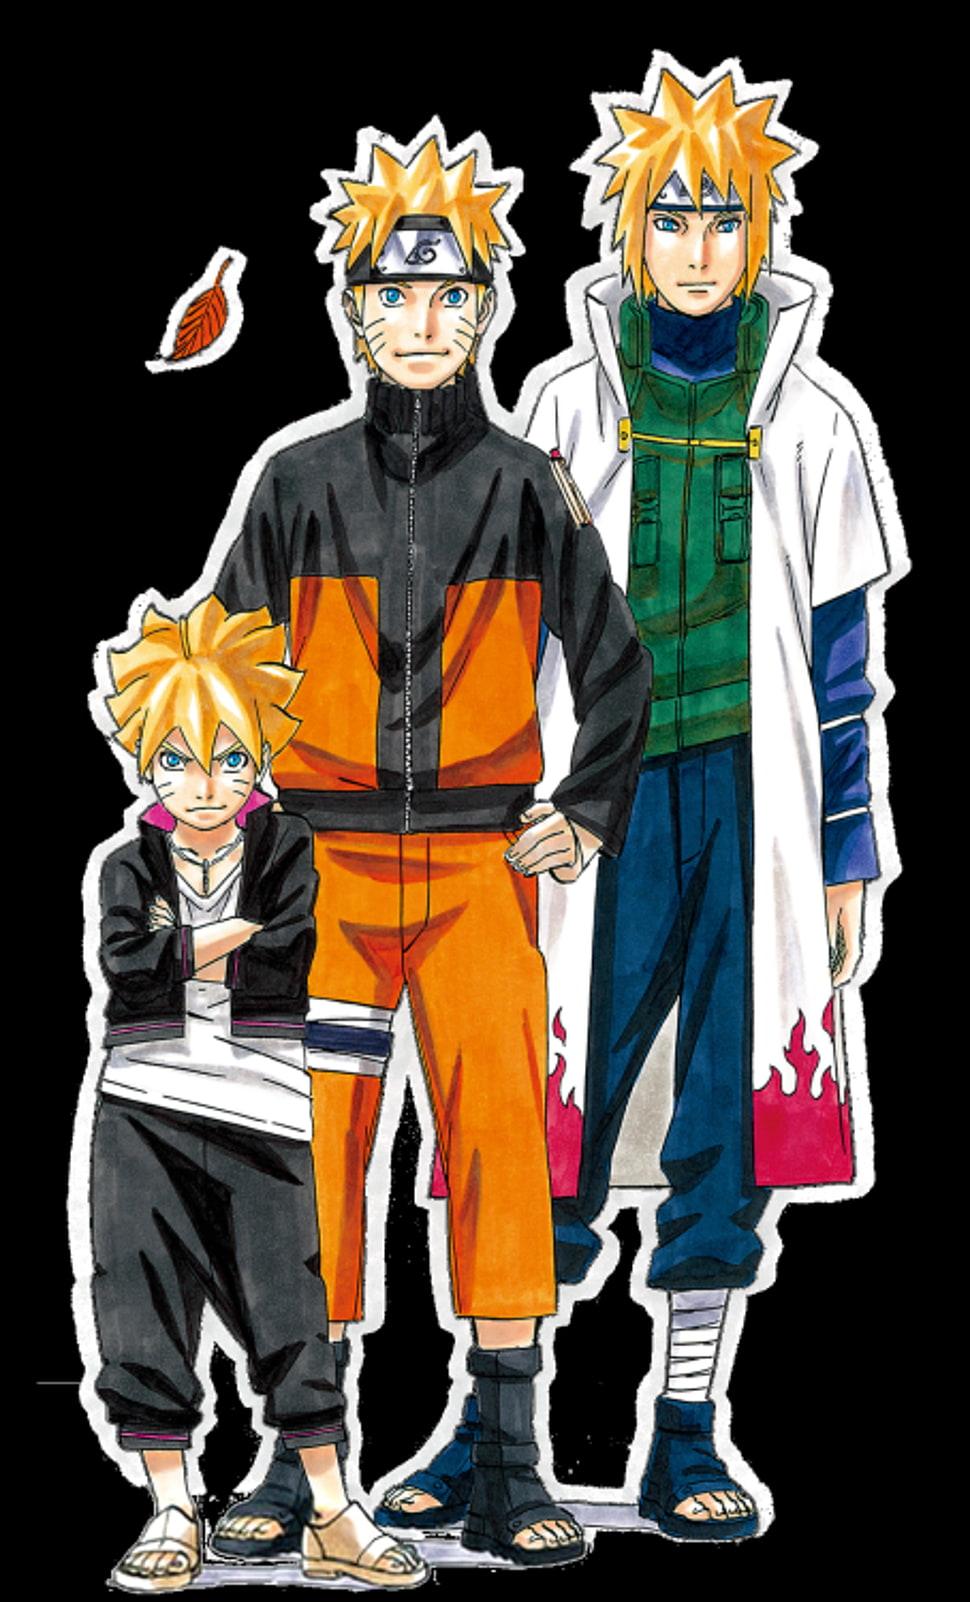 Boruto Naruto and Nagato illustration HD wallpaper